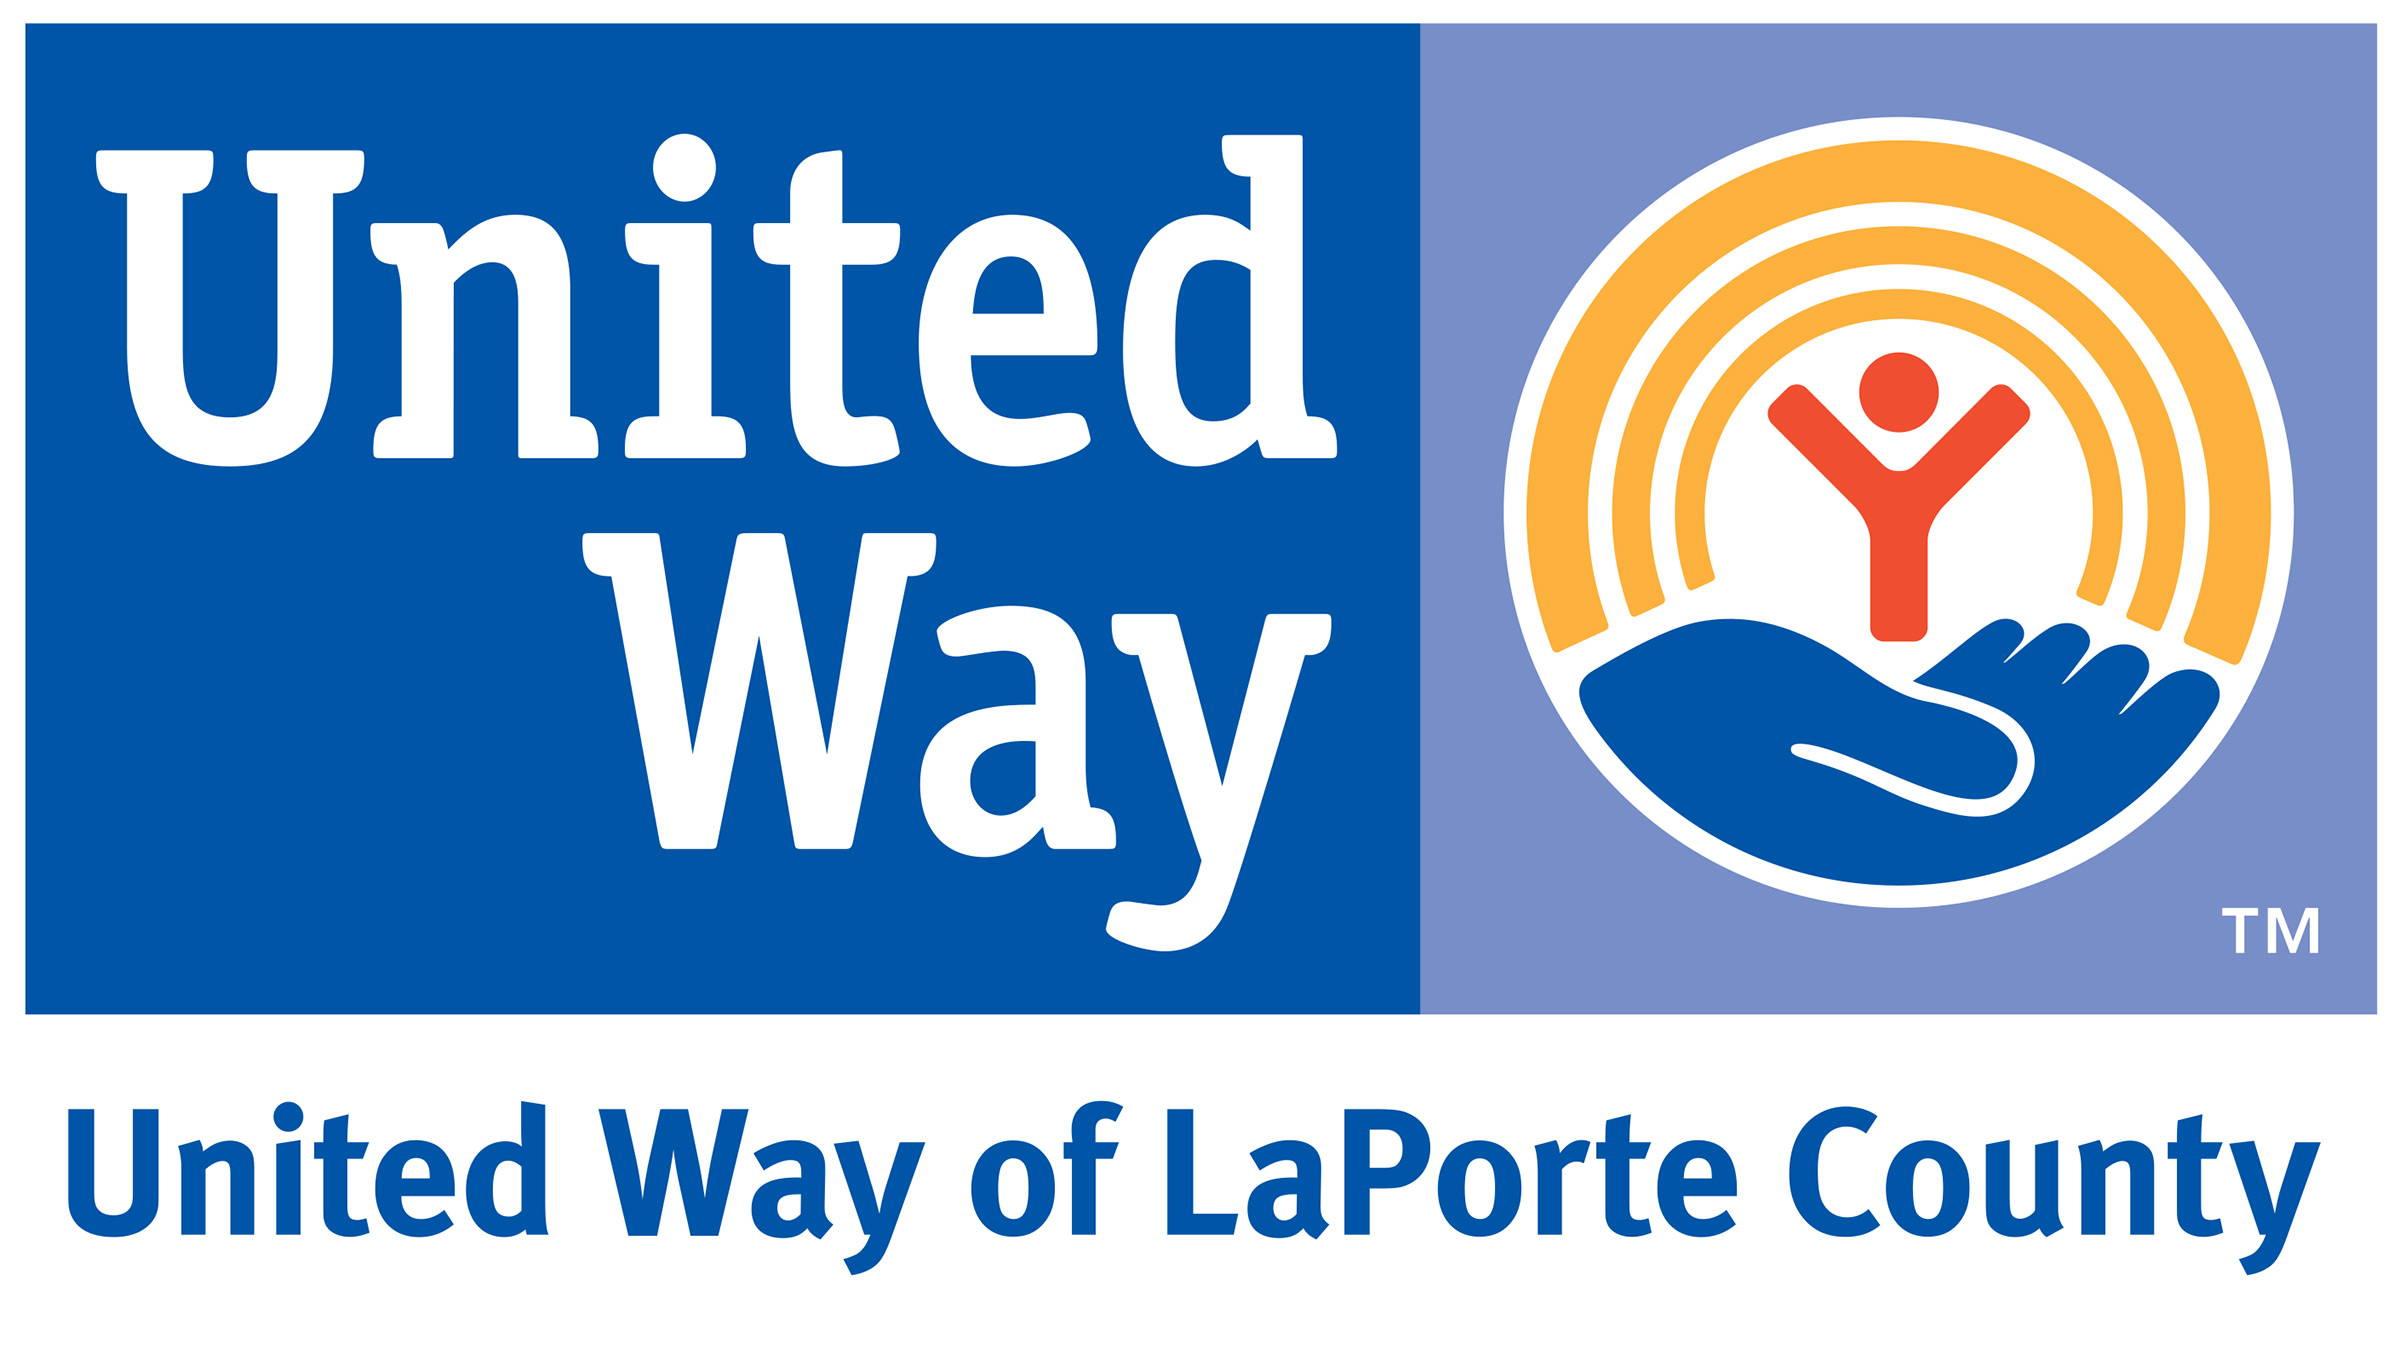 United Way of LaPorte County